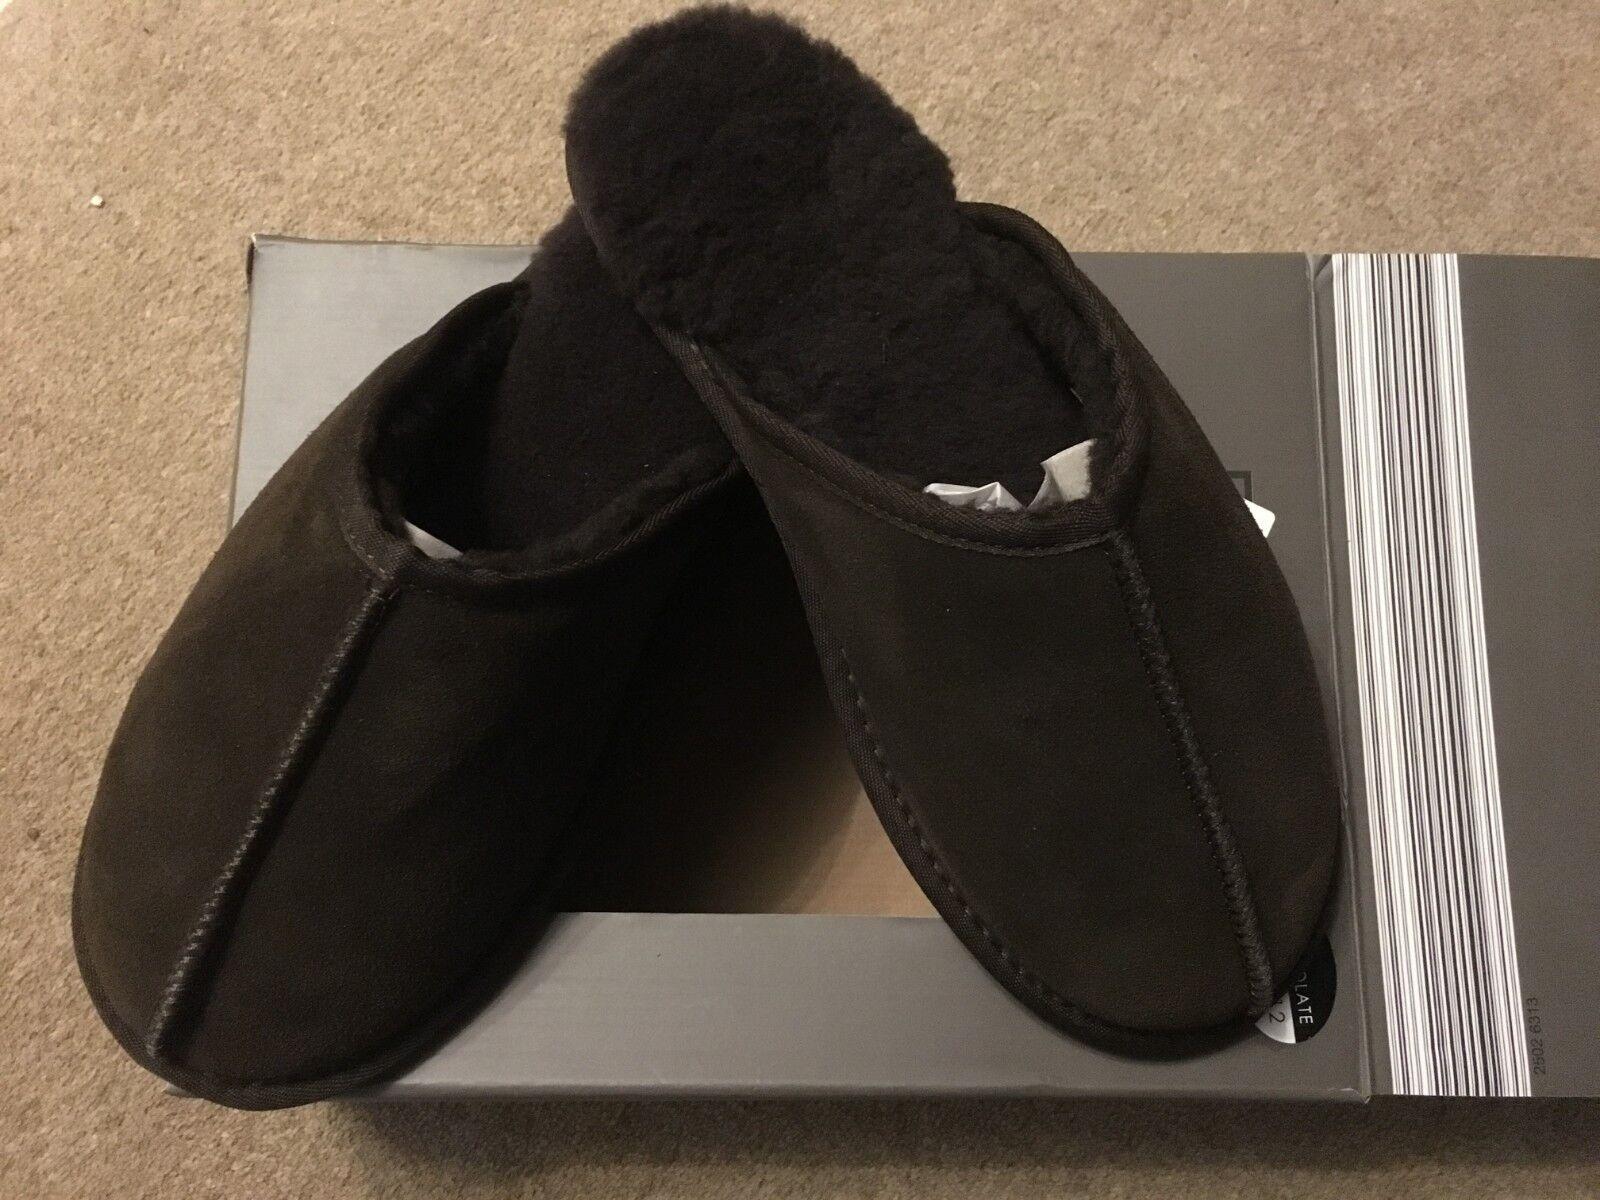 Aldi Sheepskin Slippers Size 9 - 10